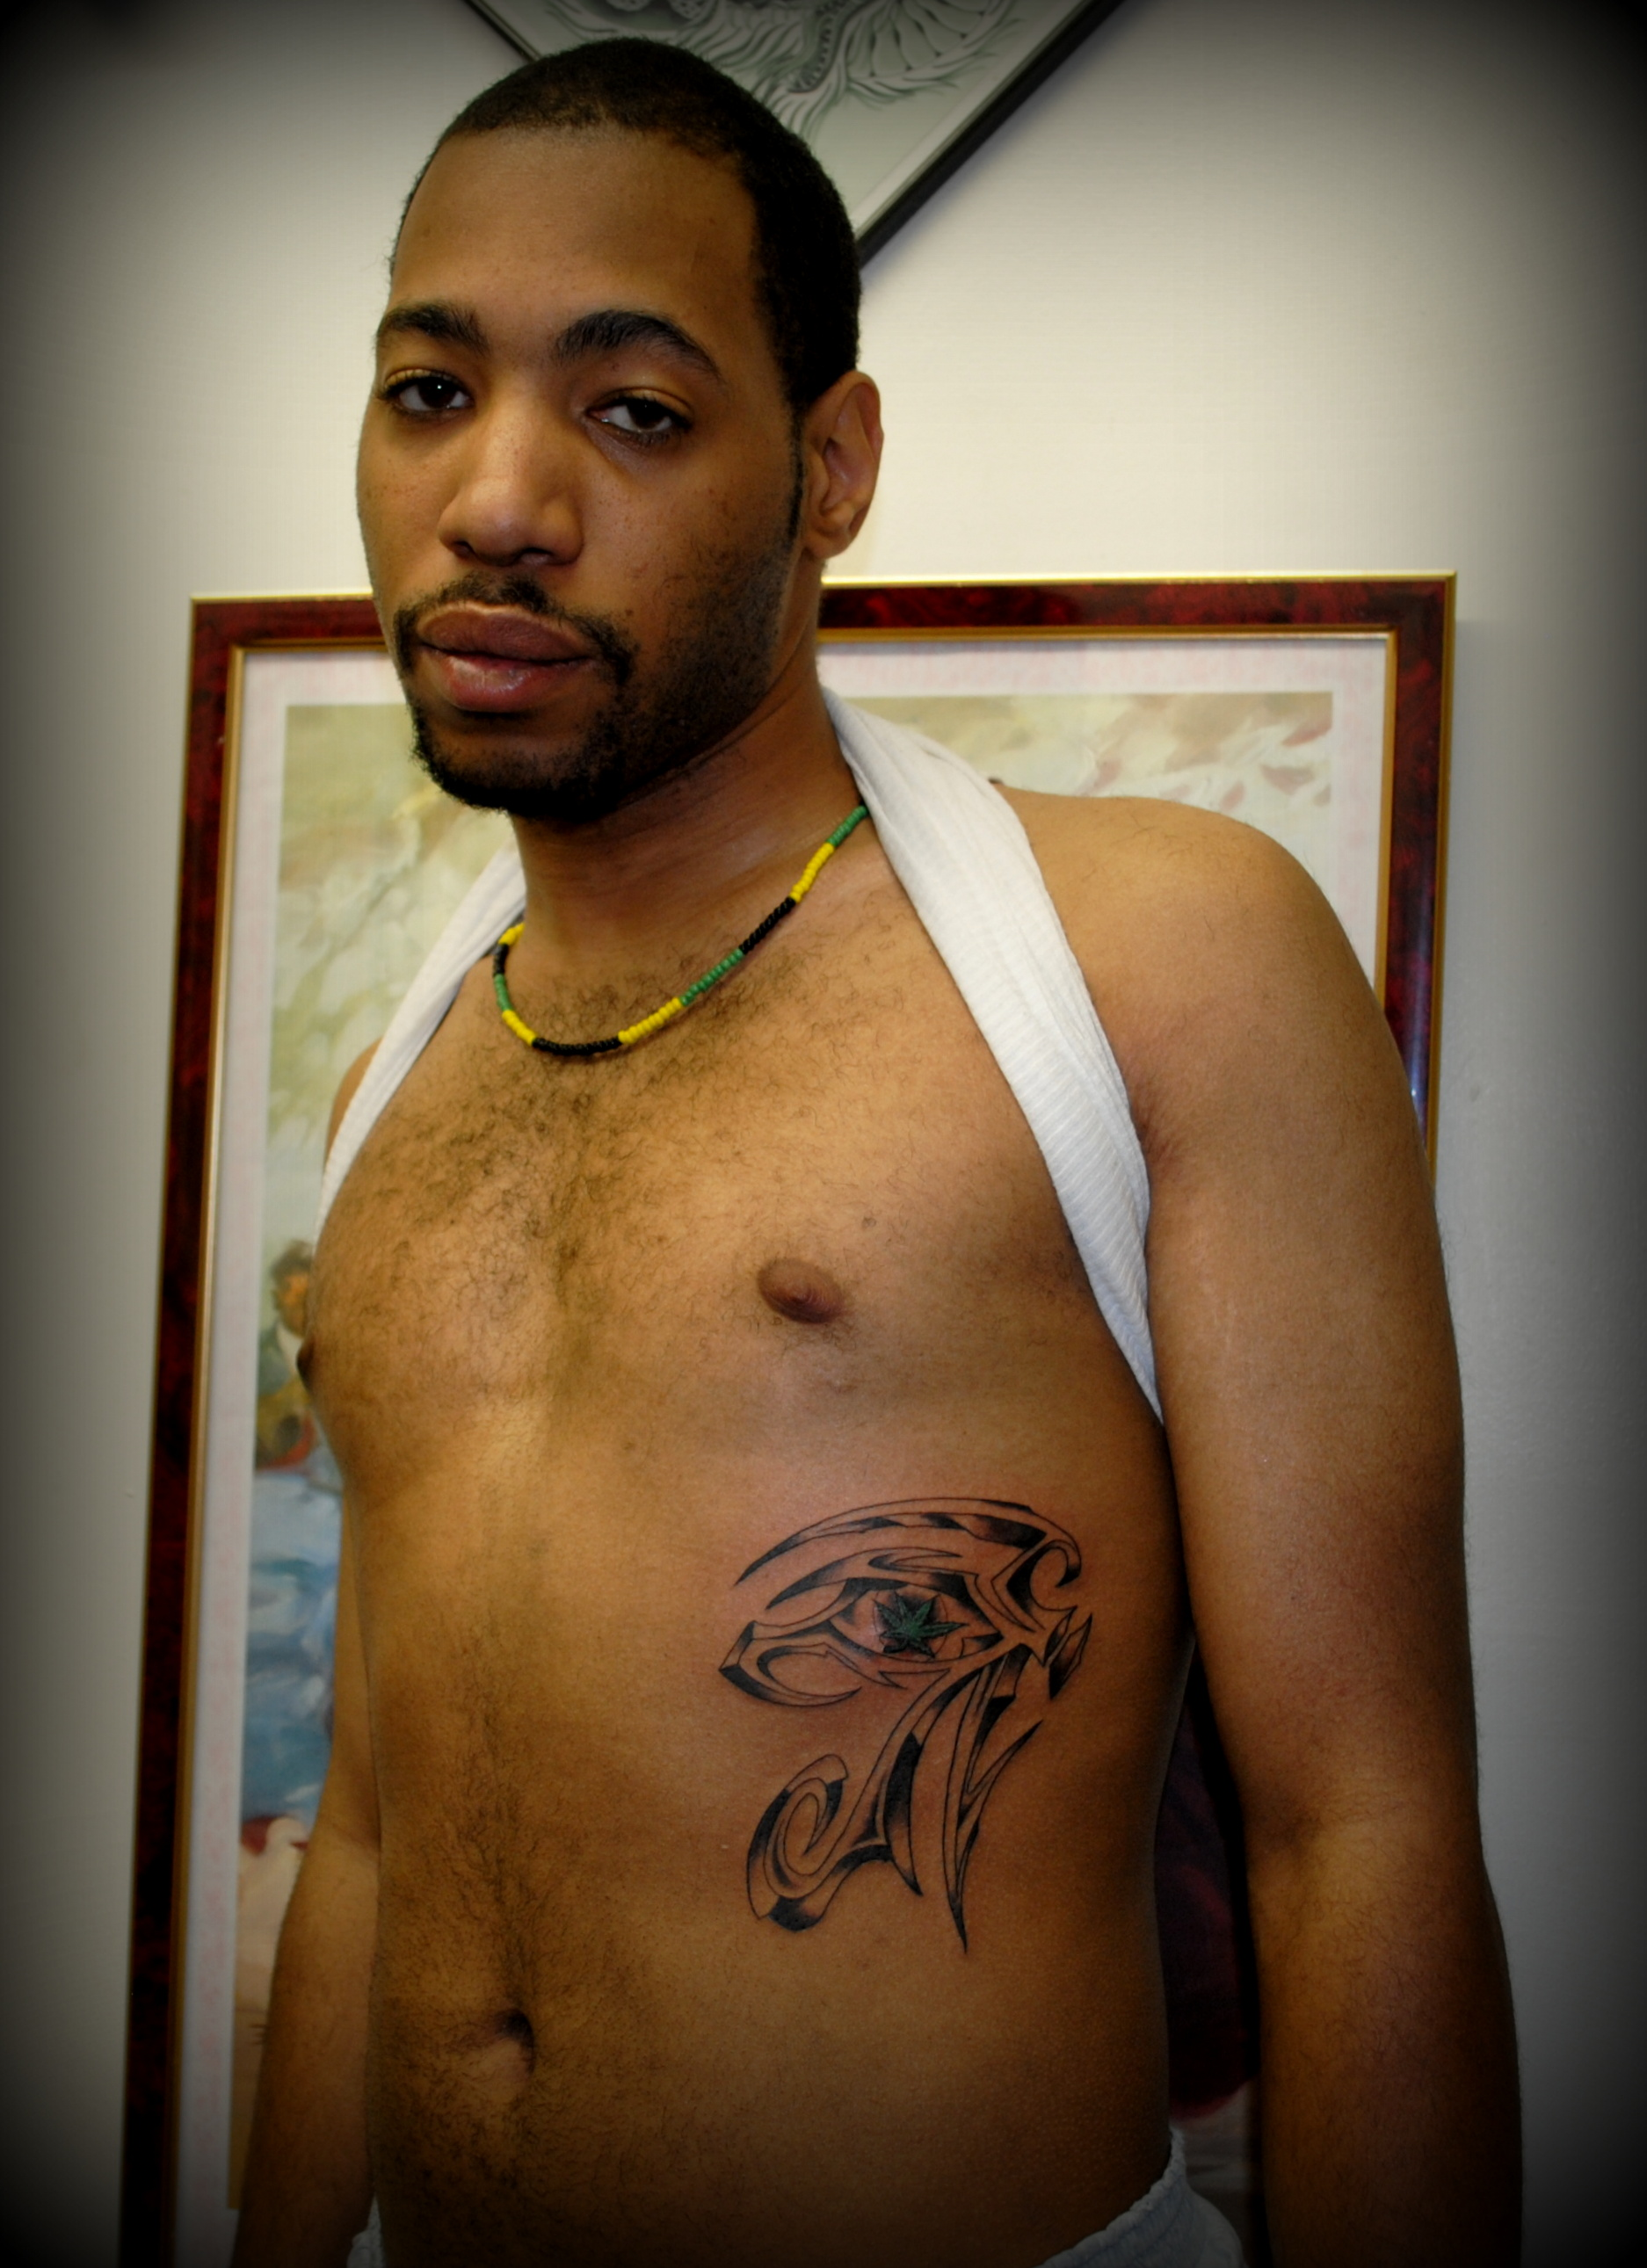 Eye of Ra Tattoo by The Red Parlour Tatt